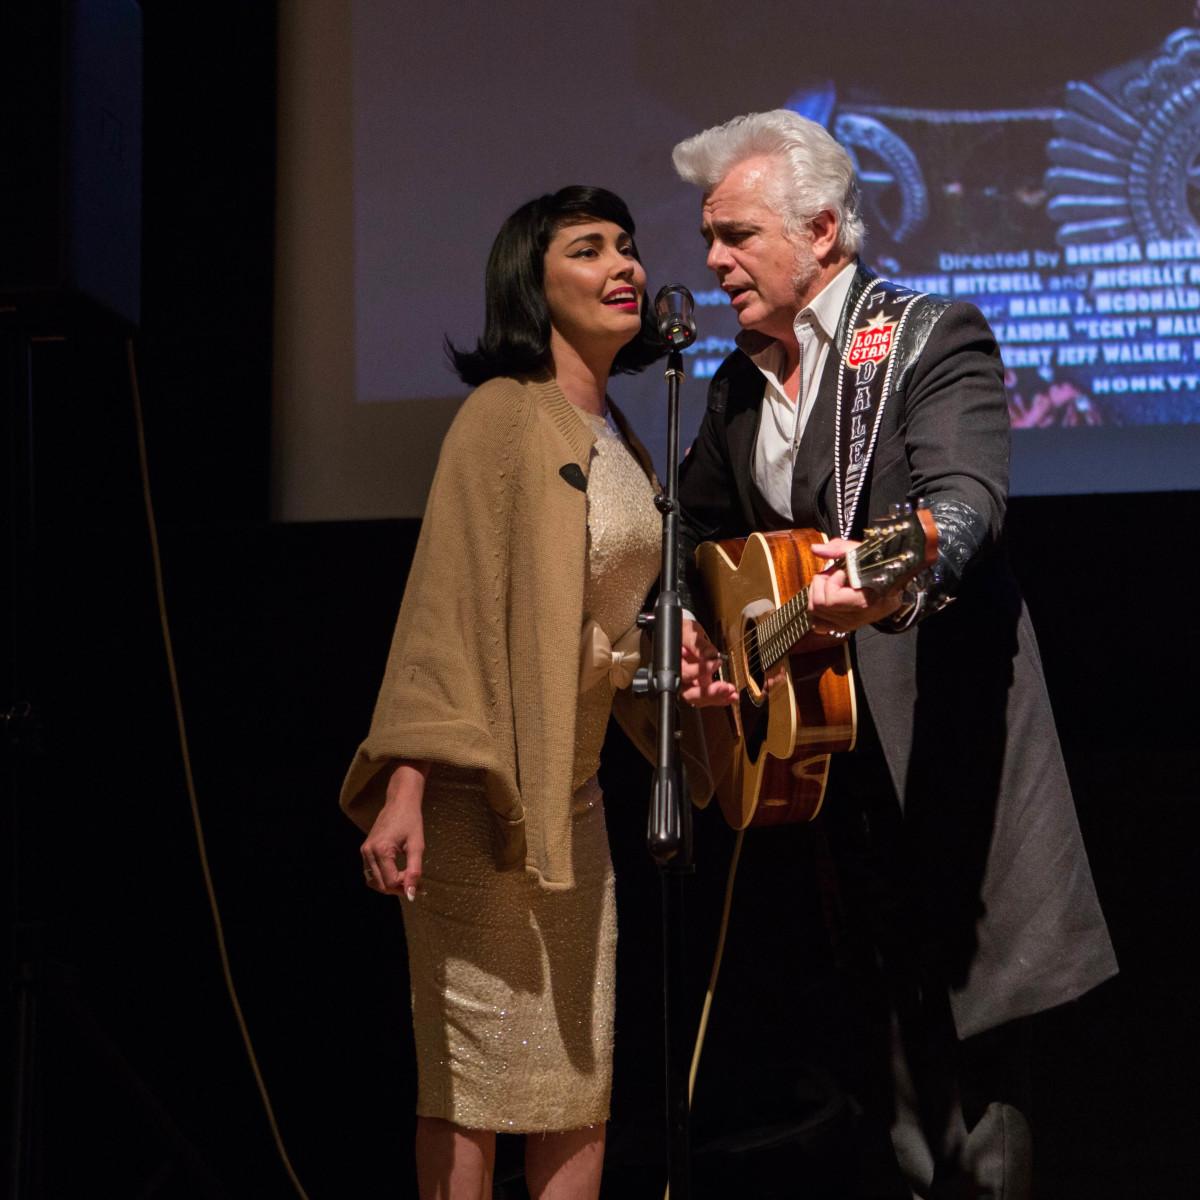 HCAF 2016 Opening Night-Celine Lee, Dale Watson;